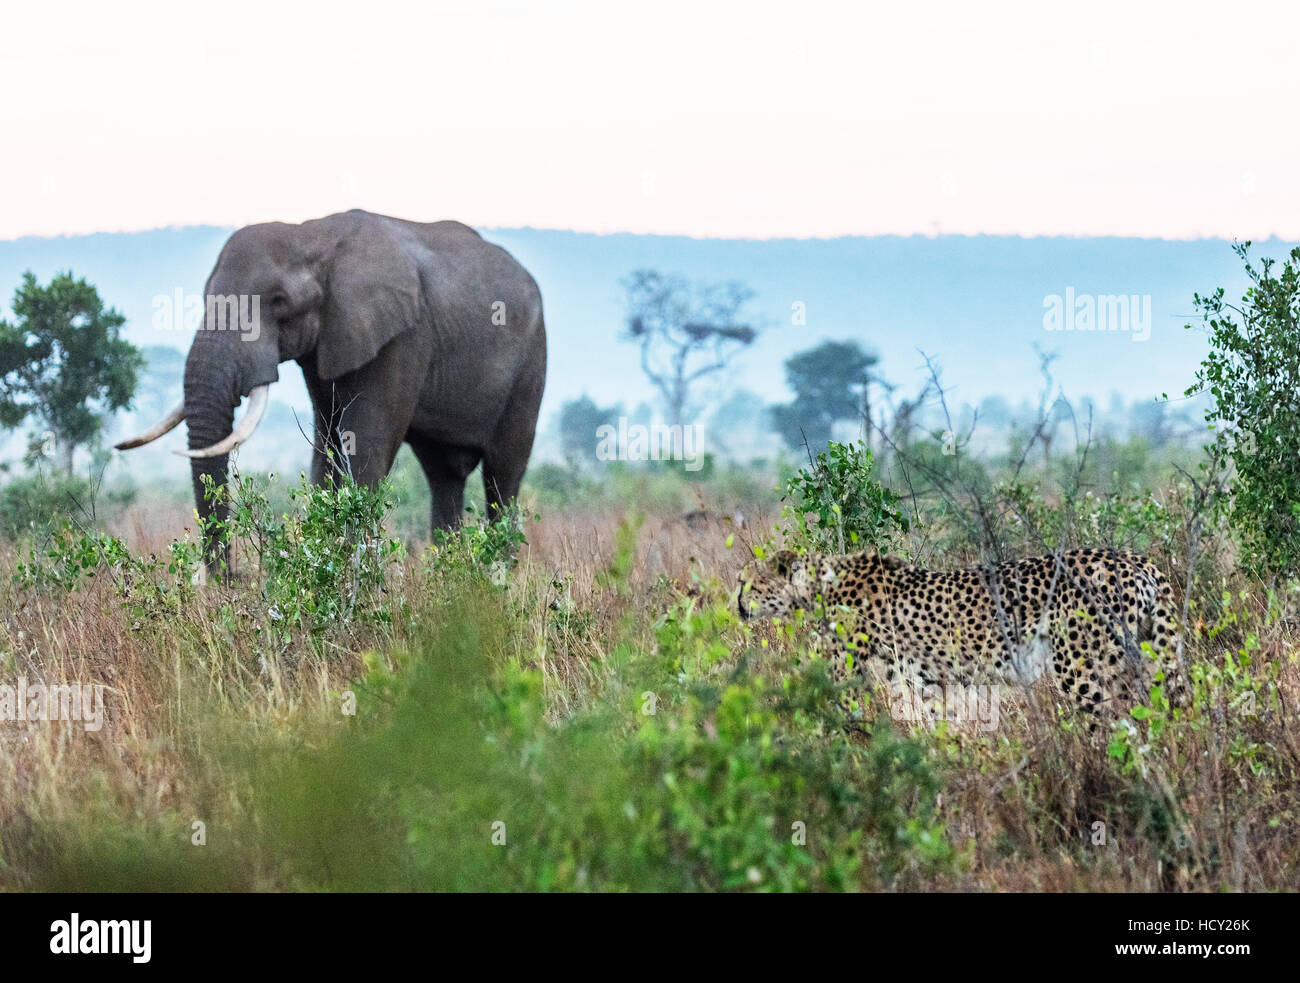 Cheetah (Acinonyx jubatus) and African elephant (Loxodonta Africana), Kruger National Park, South Africa, Africa - Stock Image